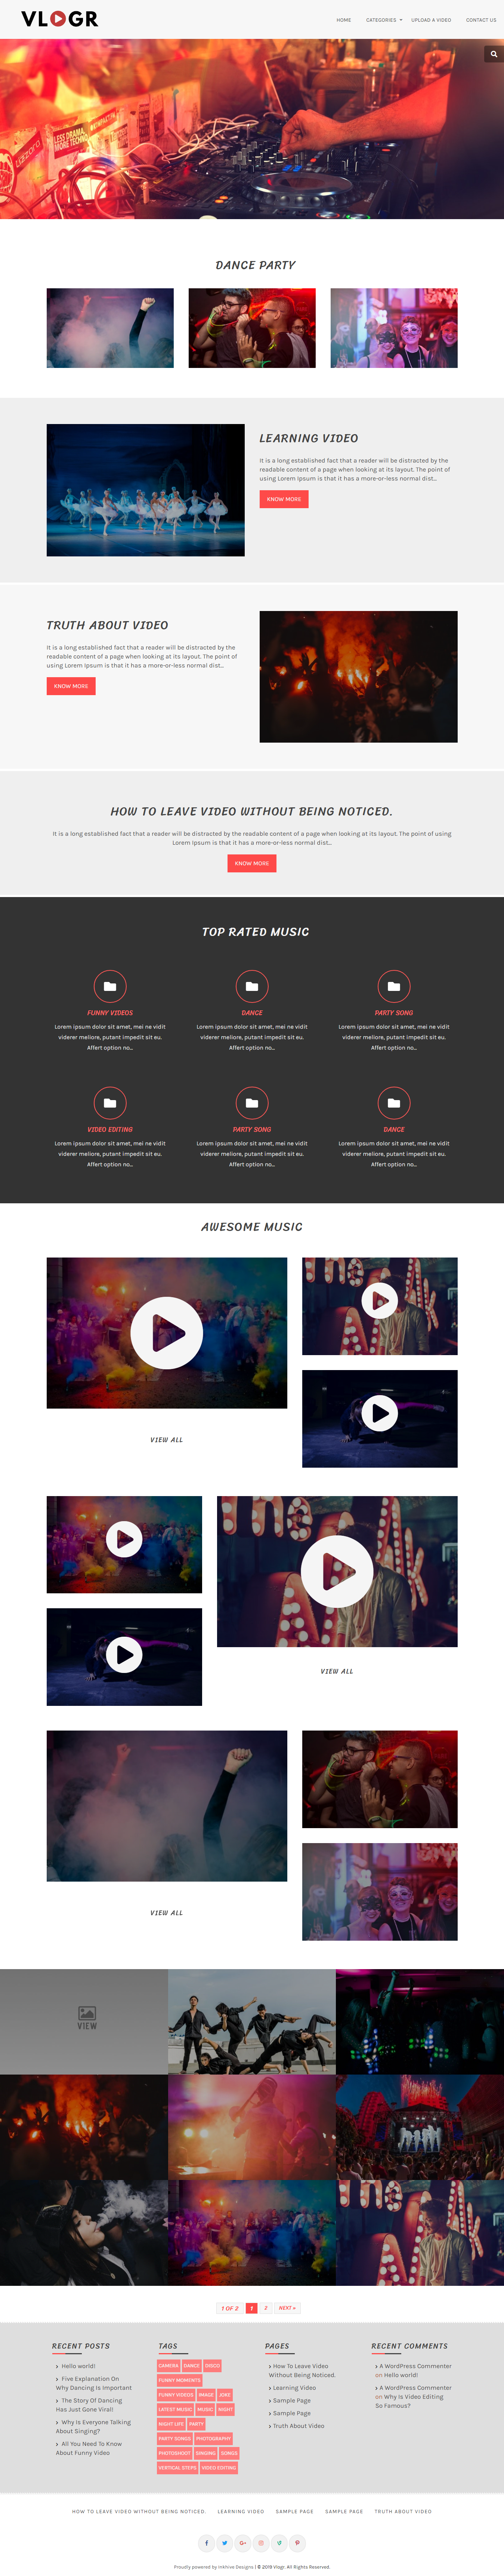 Vlogr - Best Free Video and Music WordPress Theme